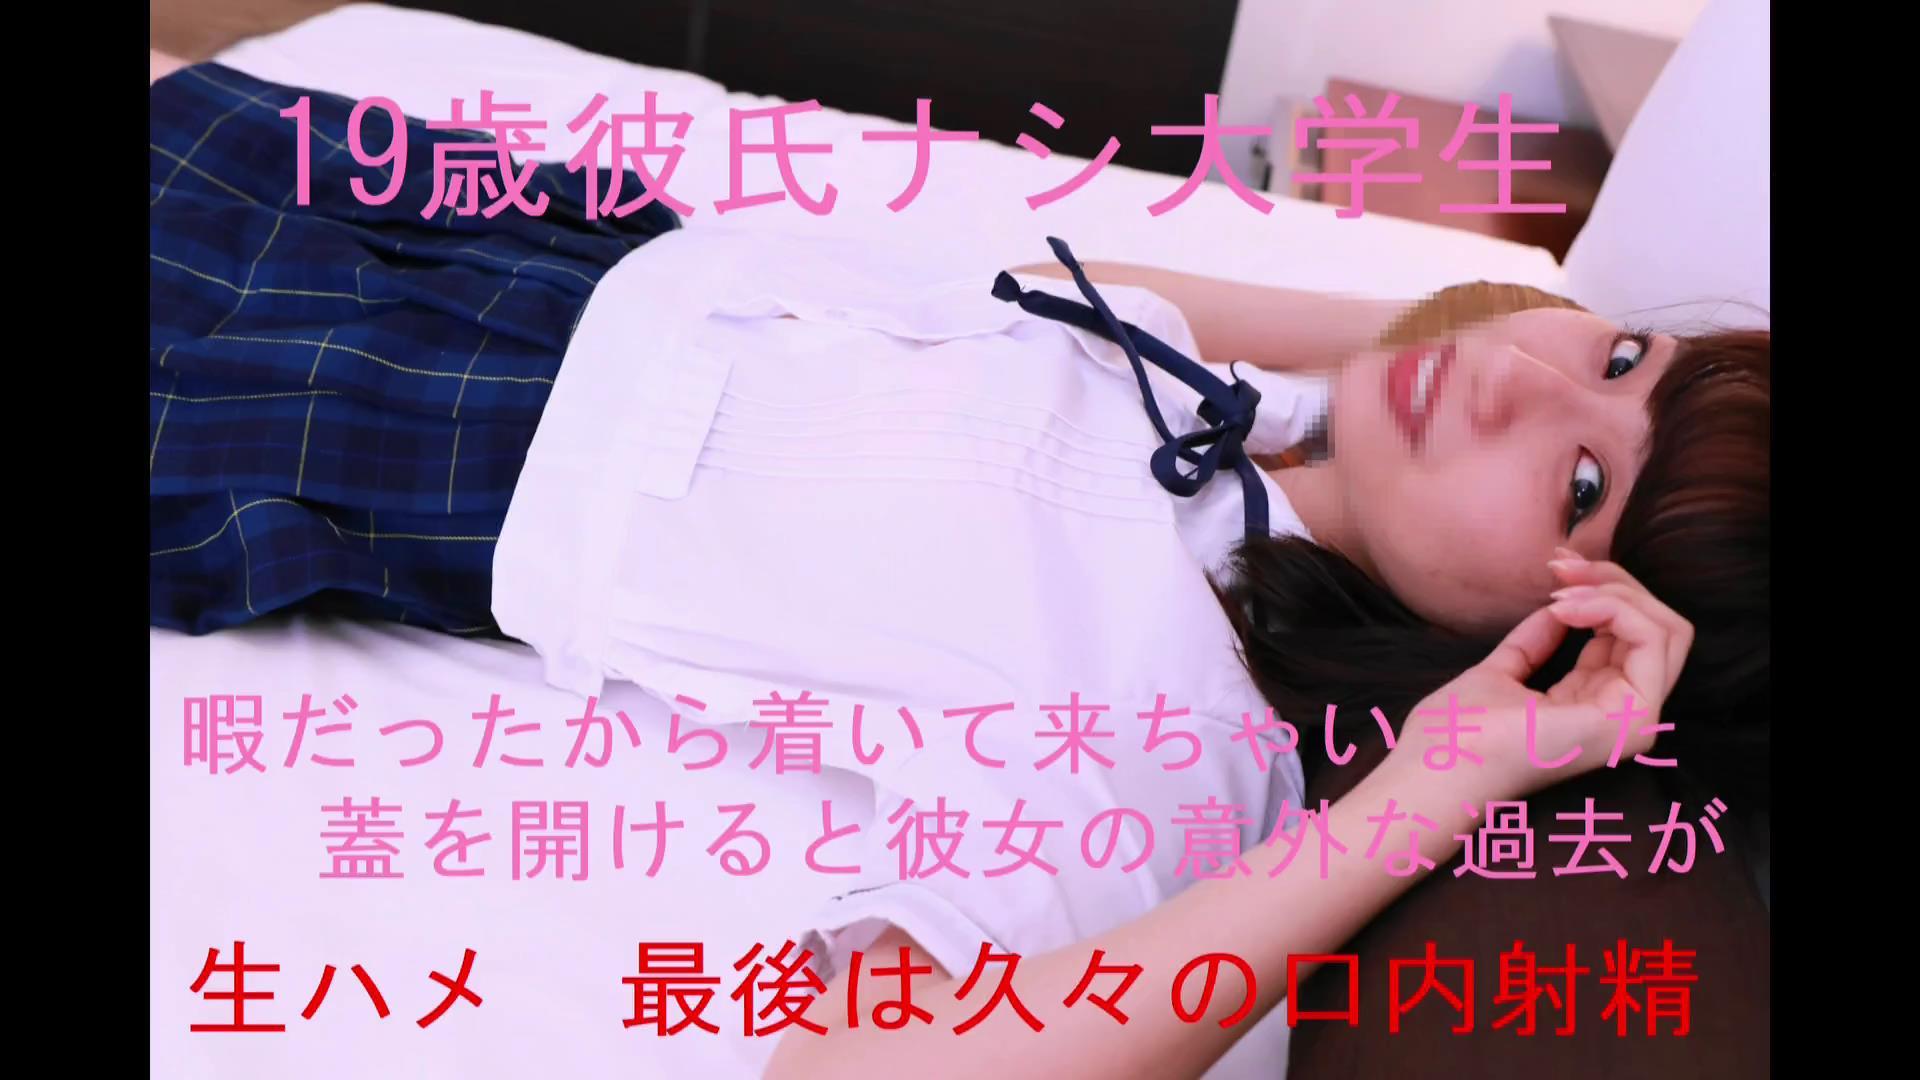 FC2-PPV-1623913 ナンパでついて来たショートカットが似合う19歳美少女には意外な過去が・・・生ハメ口内射精でご馳走様 特典付